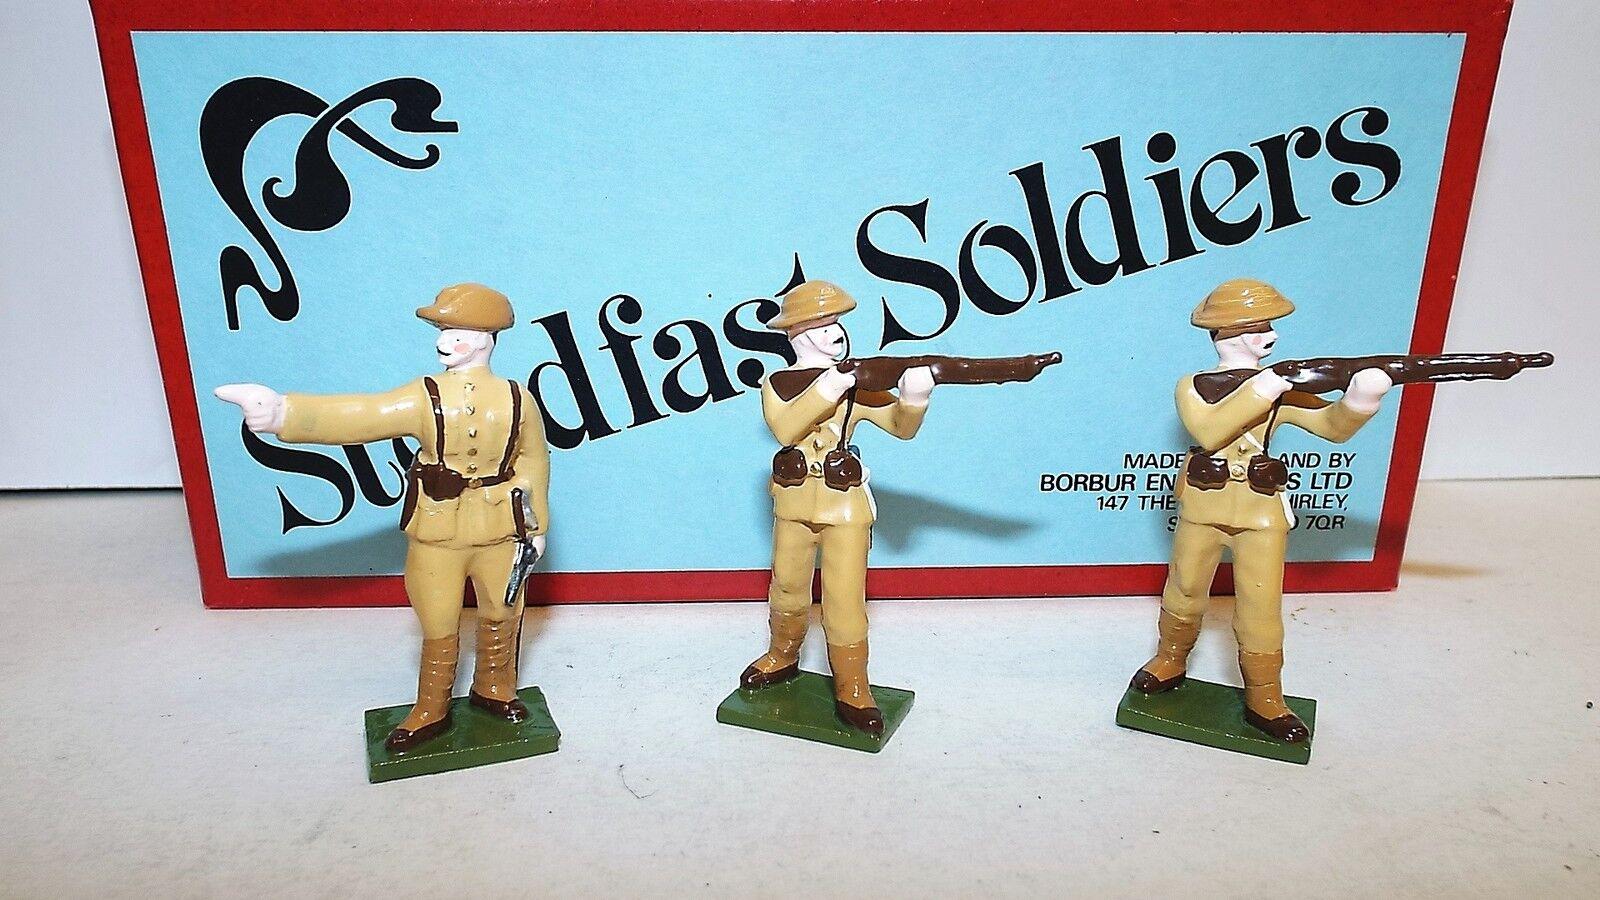 STEADFAST SOLDIERS SET SF39 3 PIECE SOLDIER SET UNKNOWN REGIMENT BOXED (BS628)